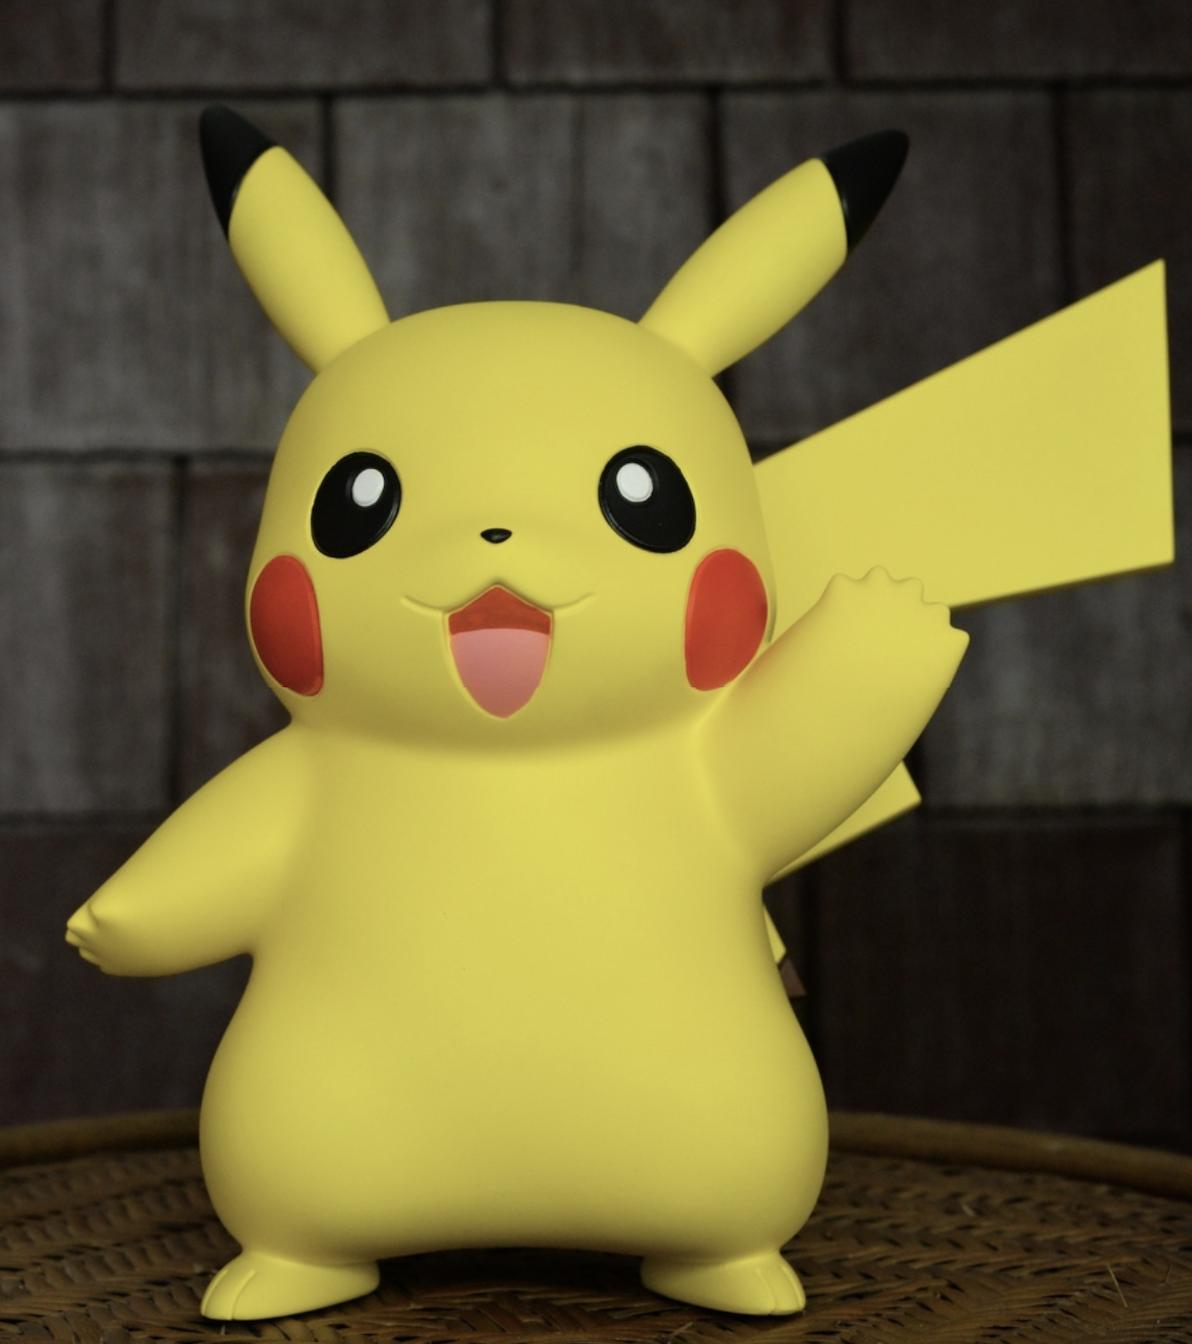 Pokemon Original Pikachu 24c-4